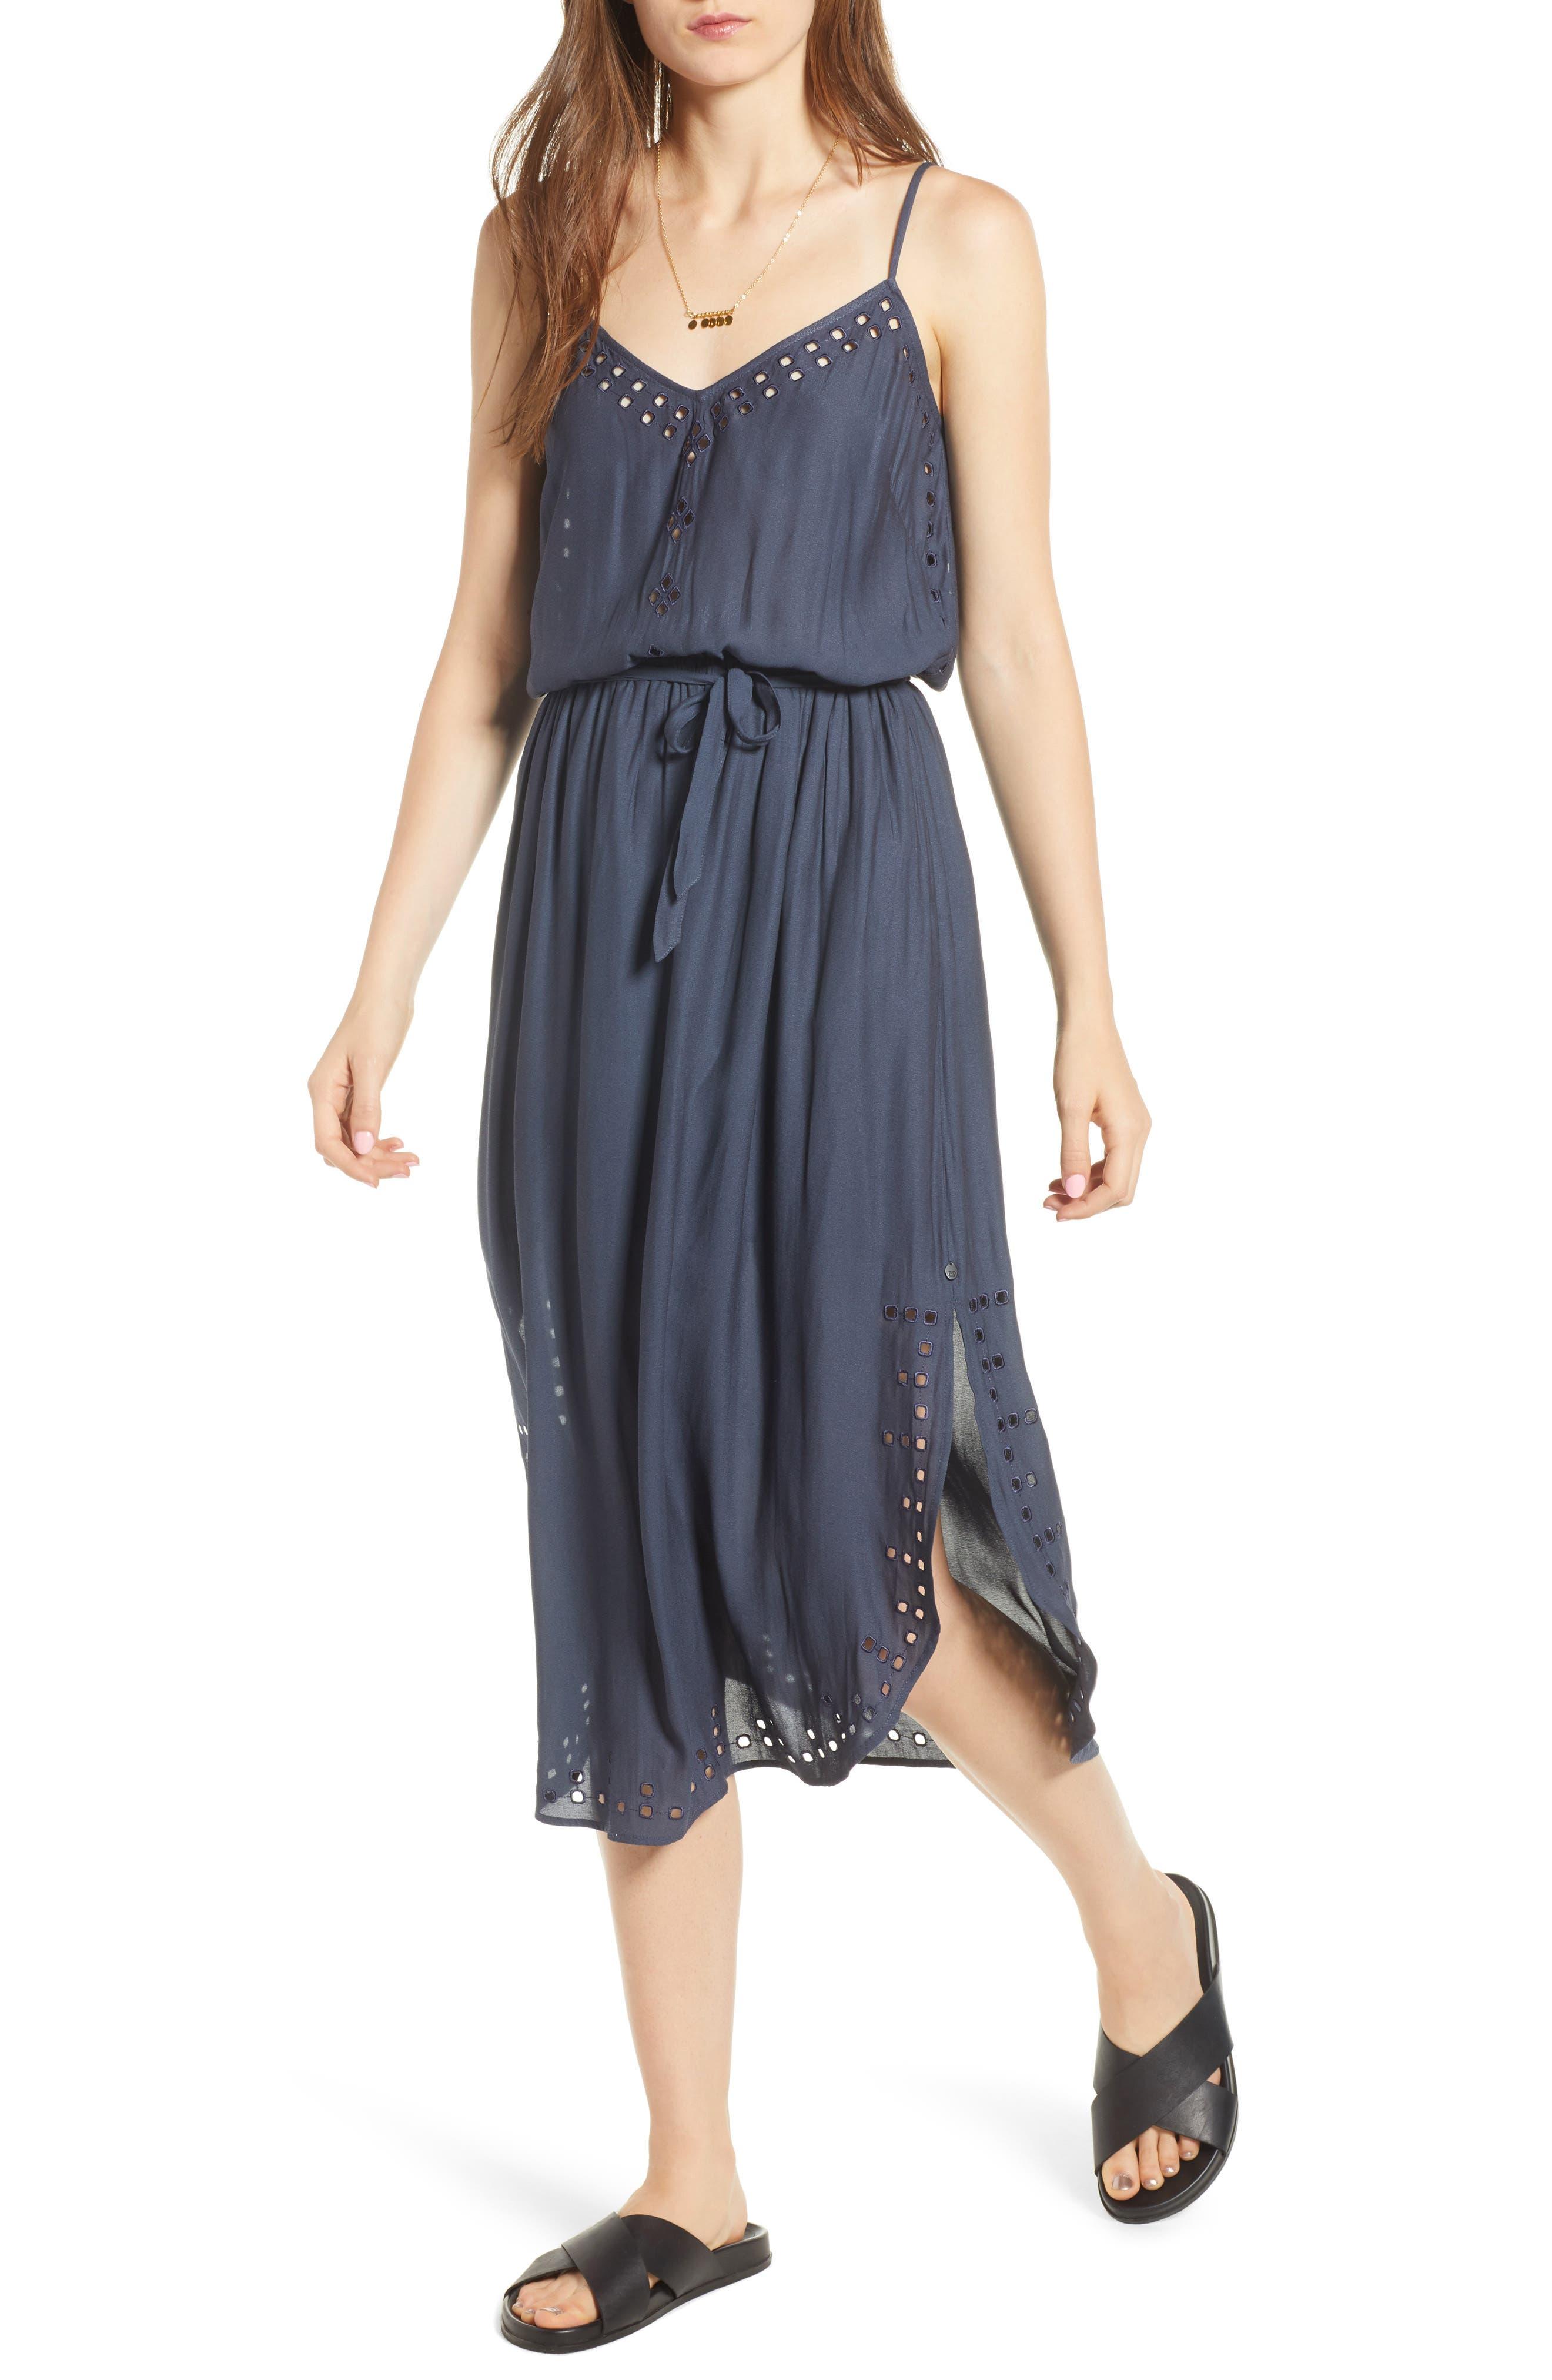 Scotch & Soda Strappy Cutout Midi Dress